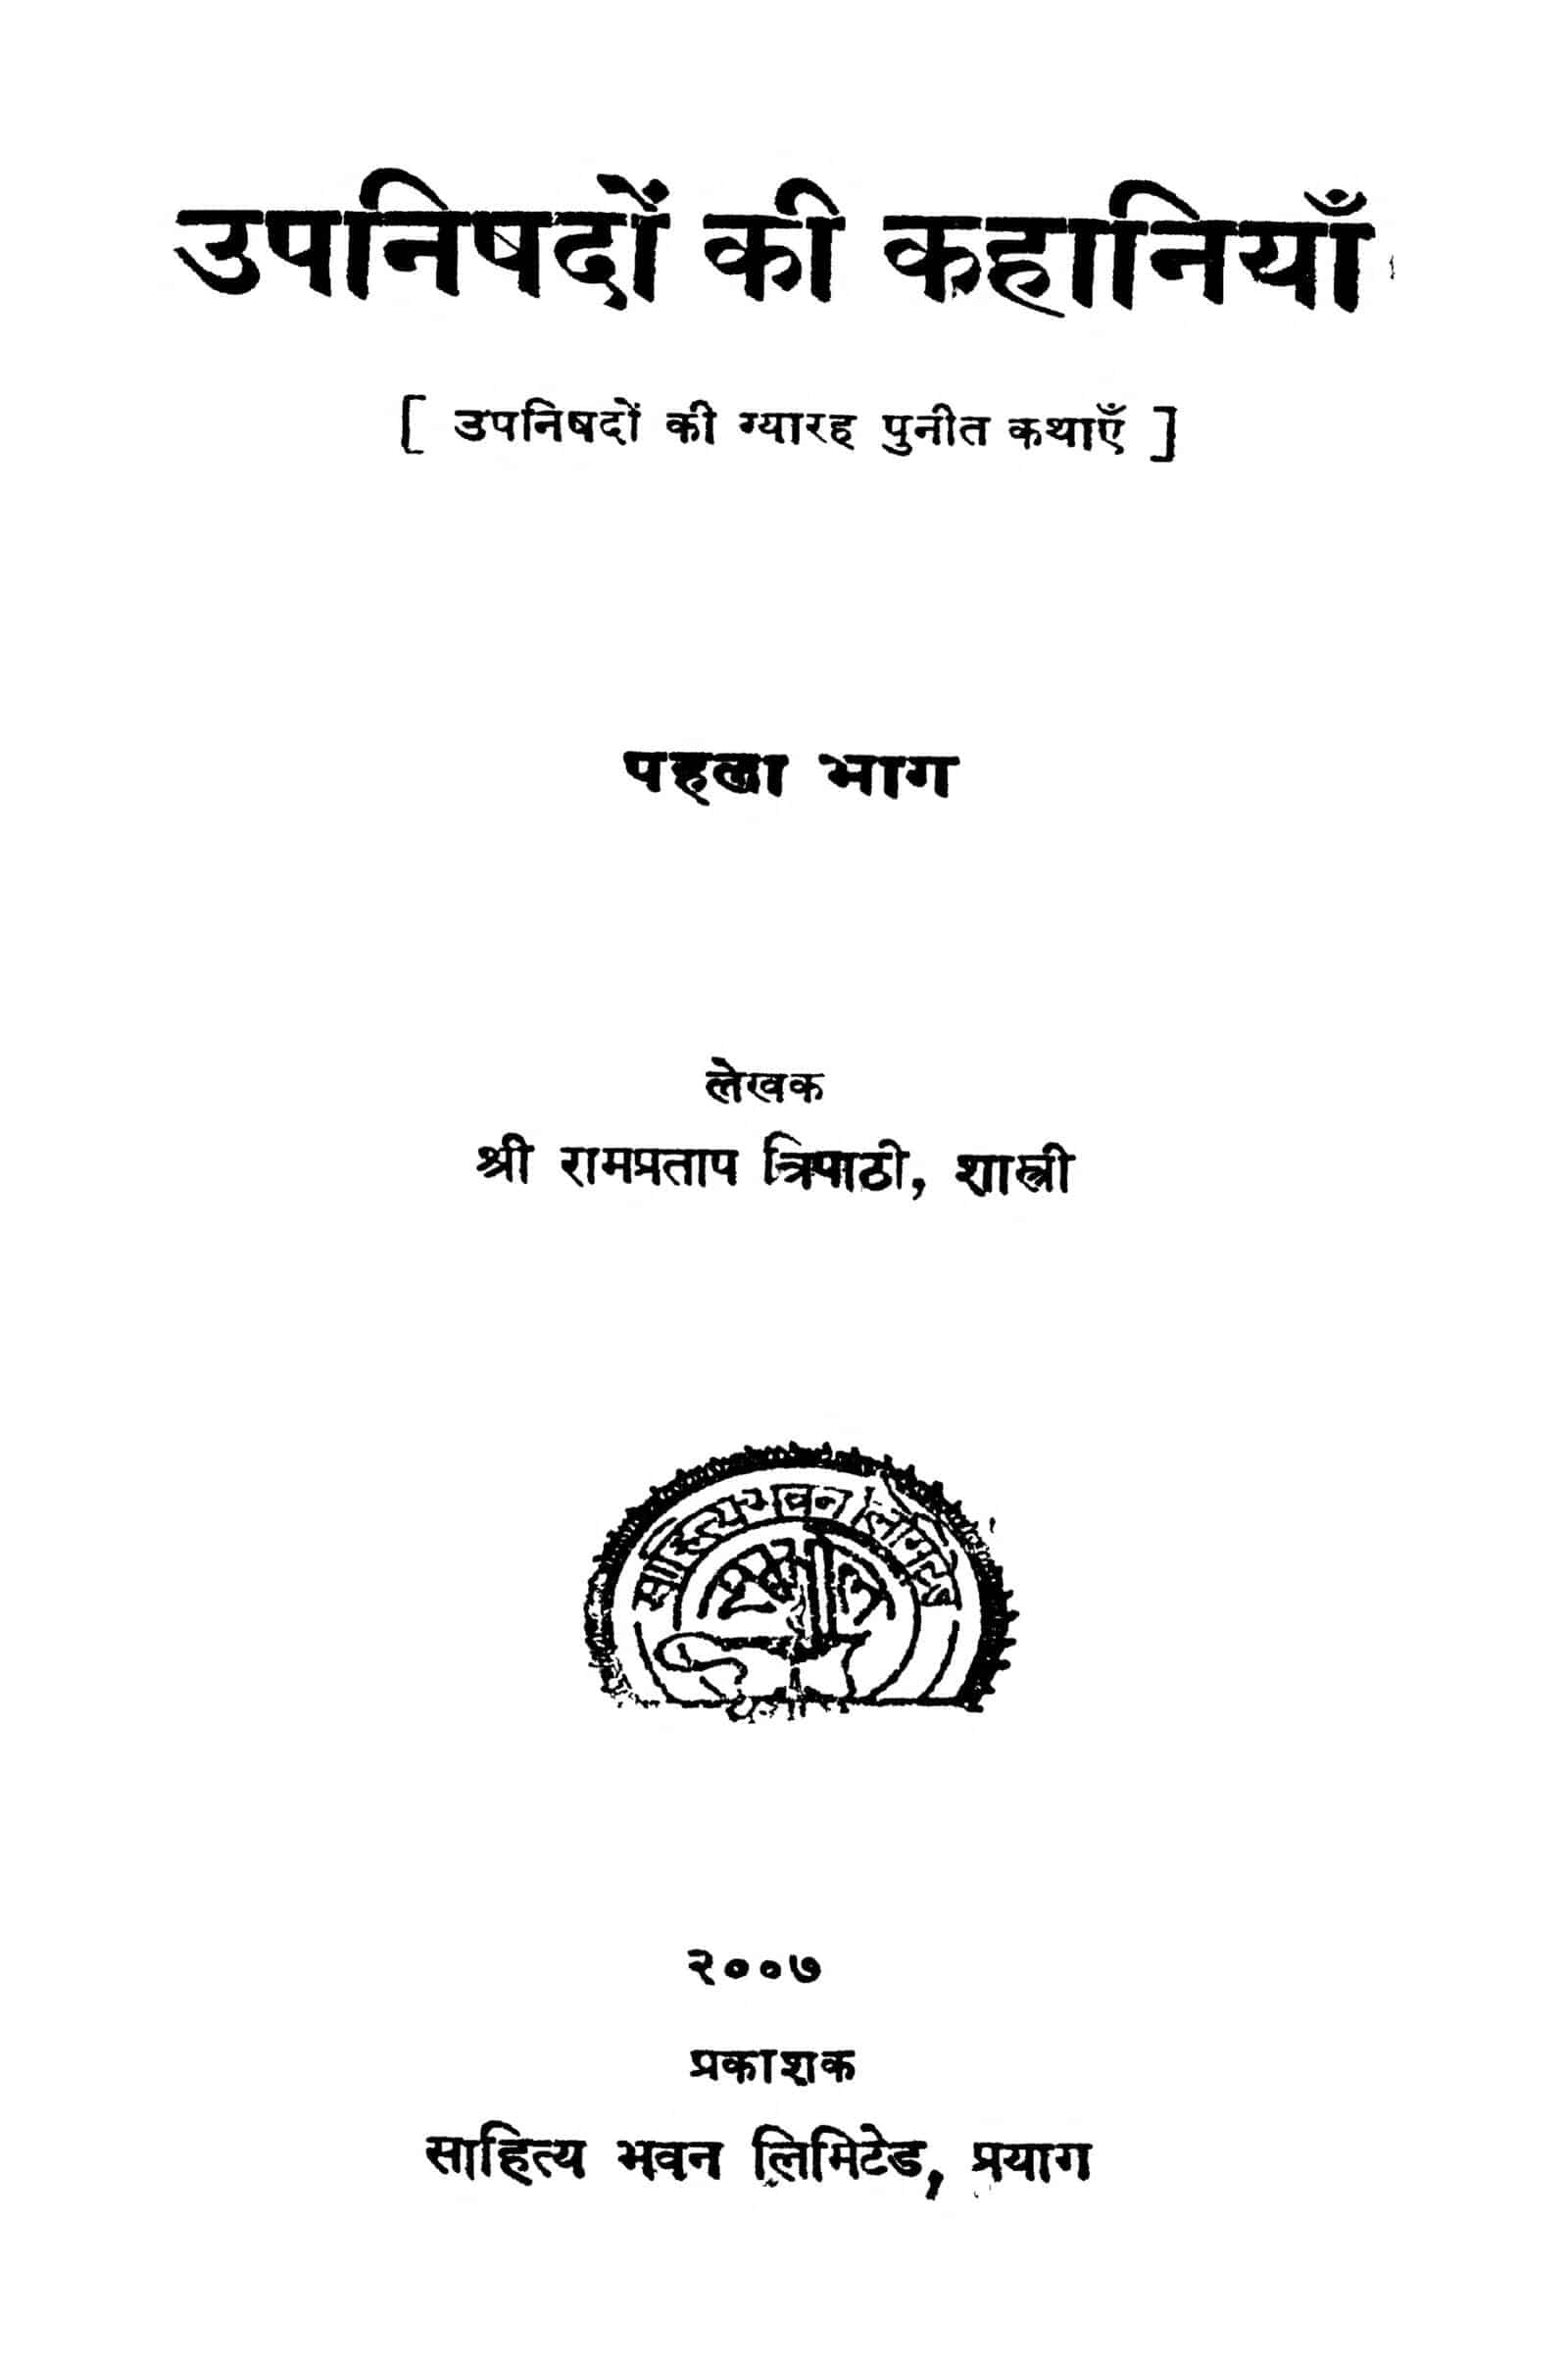 Upanishadon Ki Kahaniyan Bhag - 1  by श्री. रामप्रताप त्रिपाठी शास्त्री - Shree Rampratap Tripati Shastri